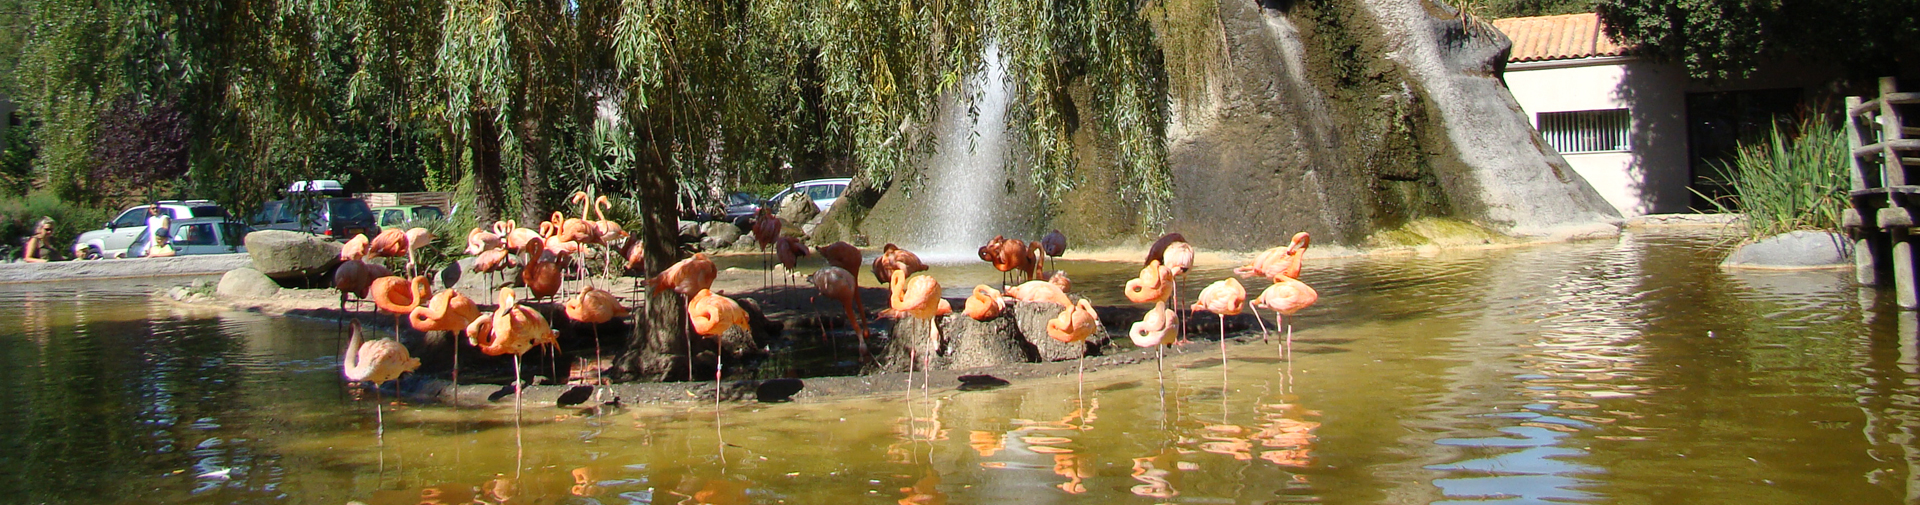 zoo-de-la-palmyre-la-palmyre-cmt17-s-gaudin